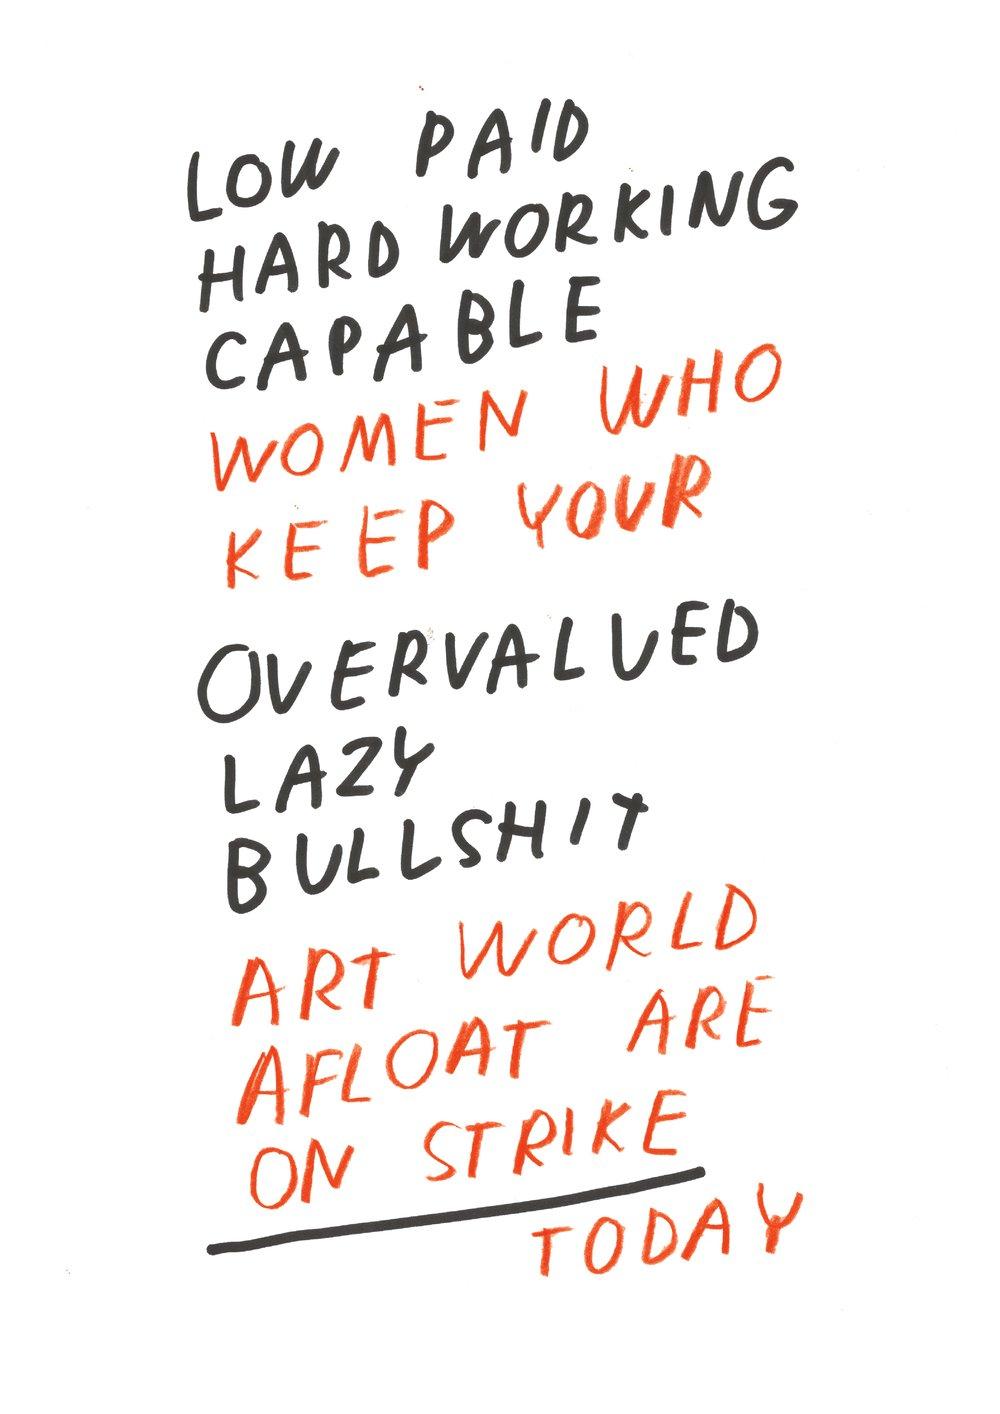 Image of women's strike